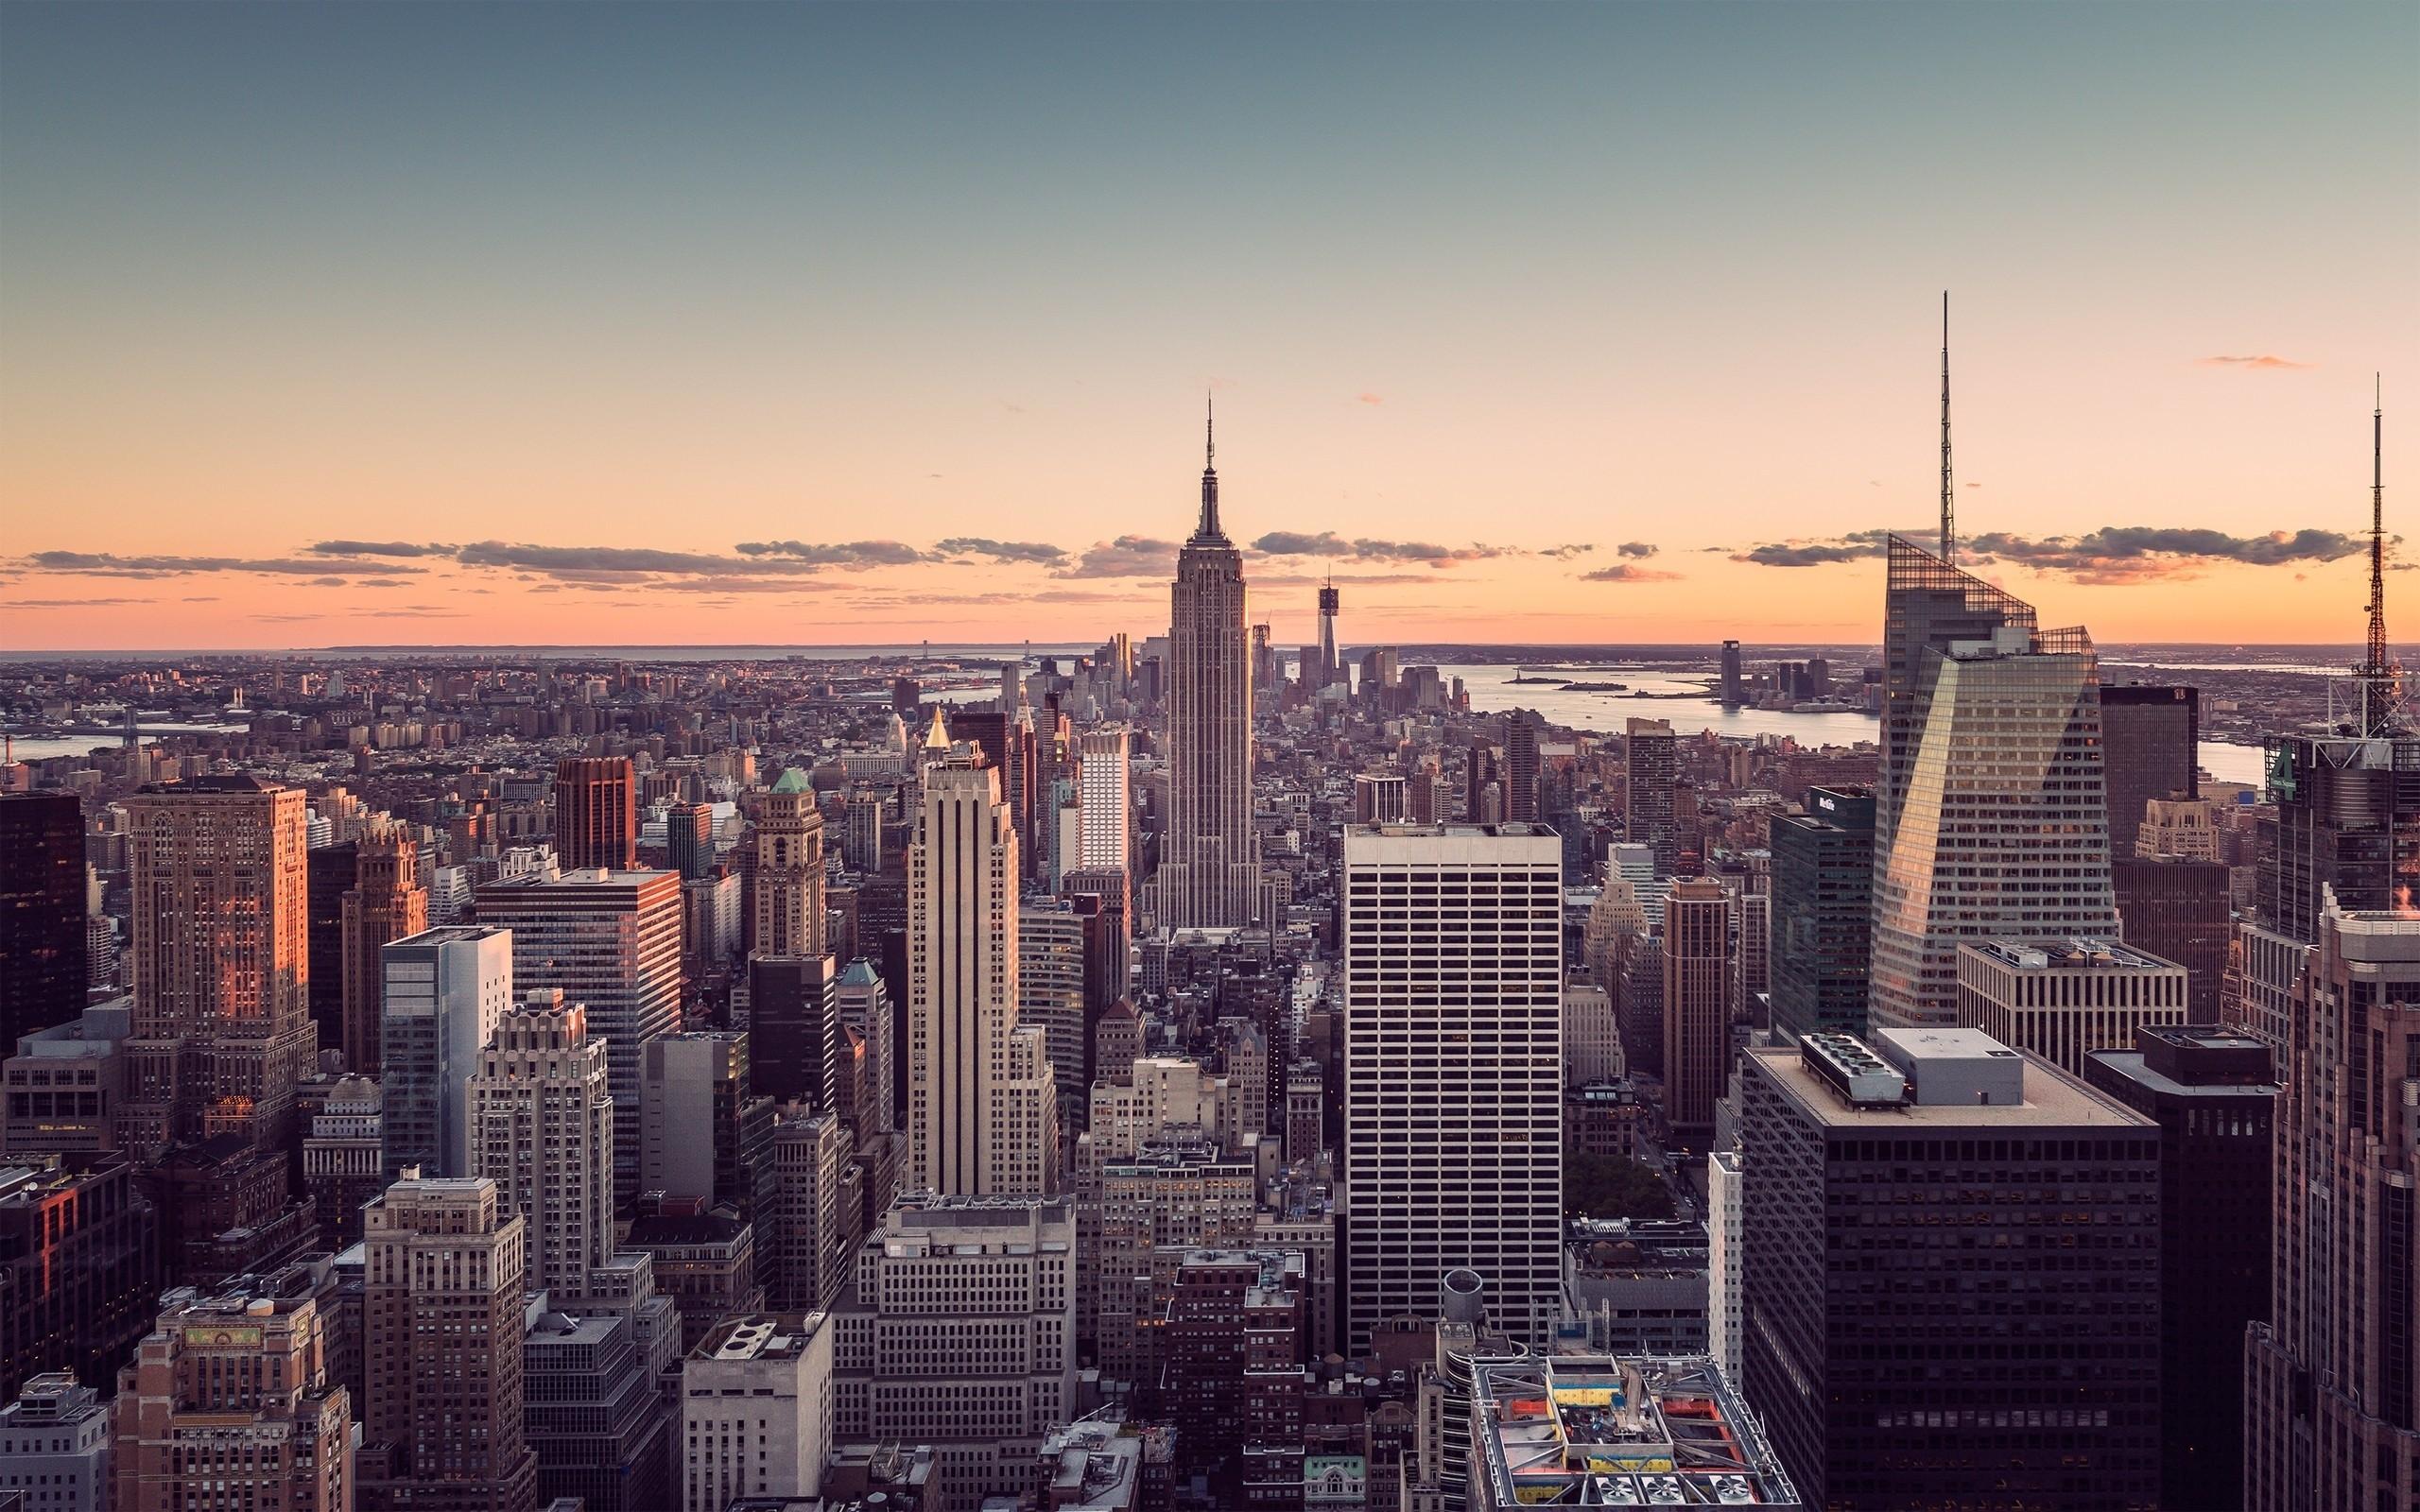 New york Wallpapers HD, Desktop Backgrounds, Images and Pictures 1680×1050 New  York Desktop Wallpapers (28 Wallpapers) | Adorable Wallpapers | Pinterest  …